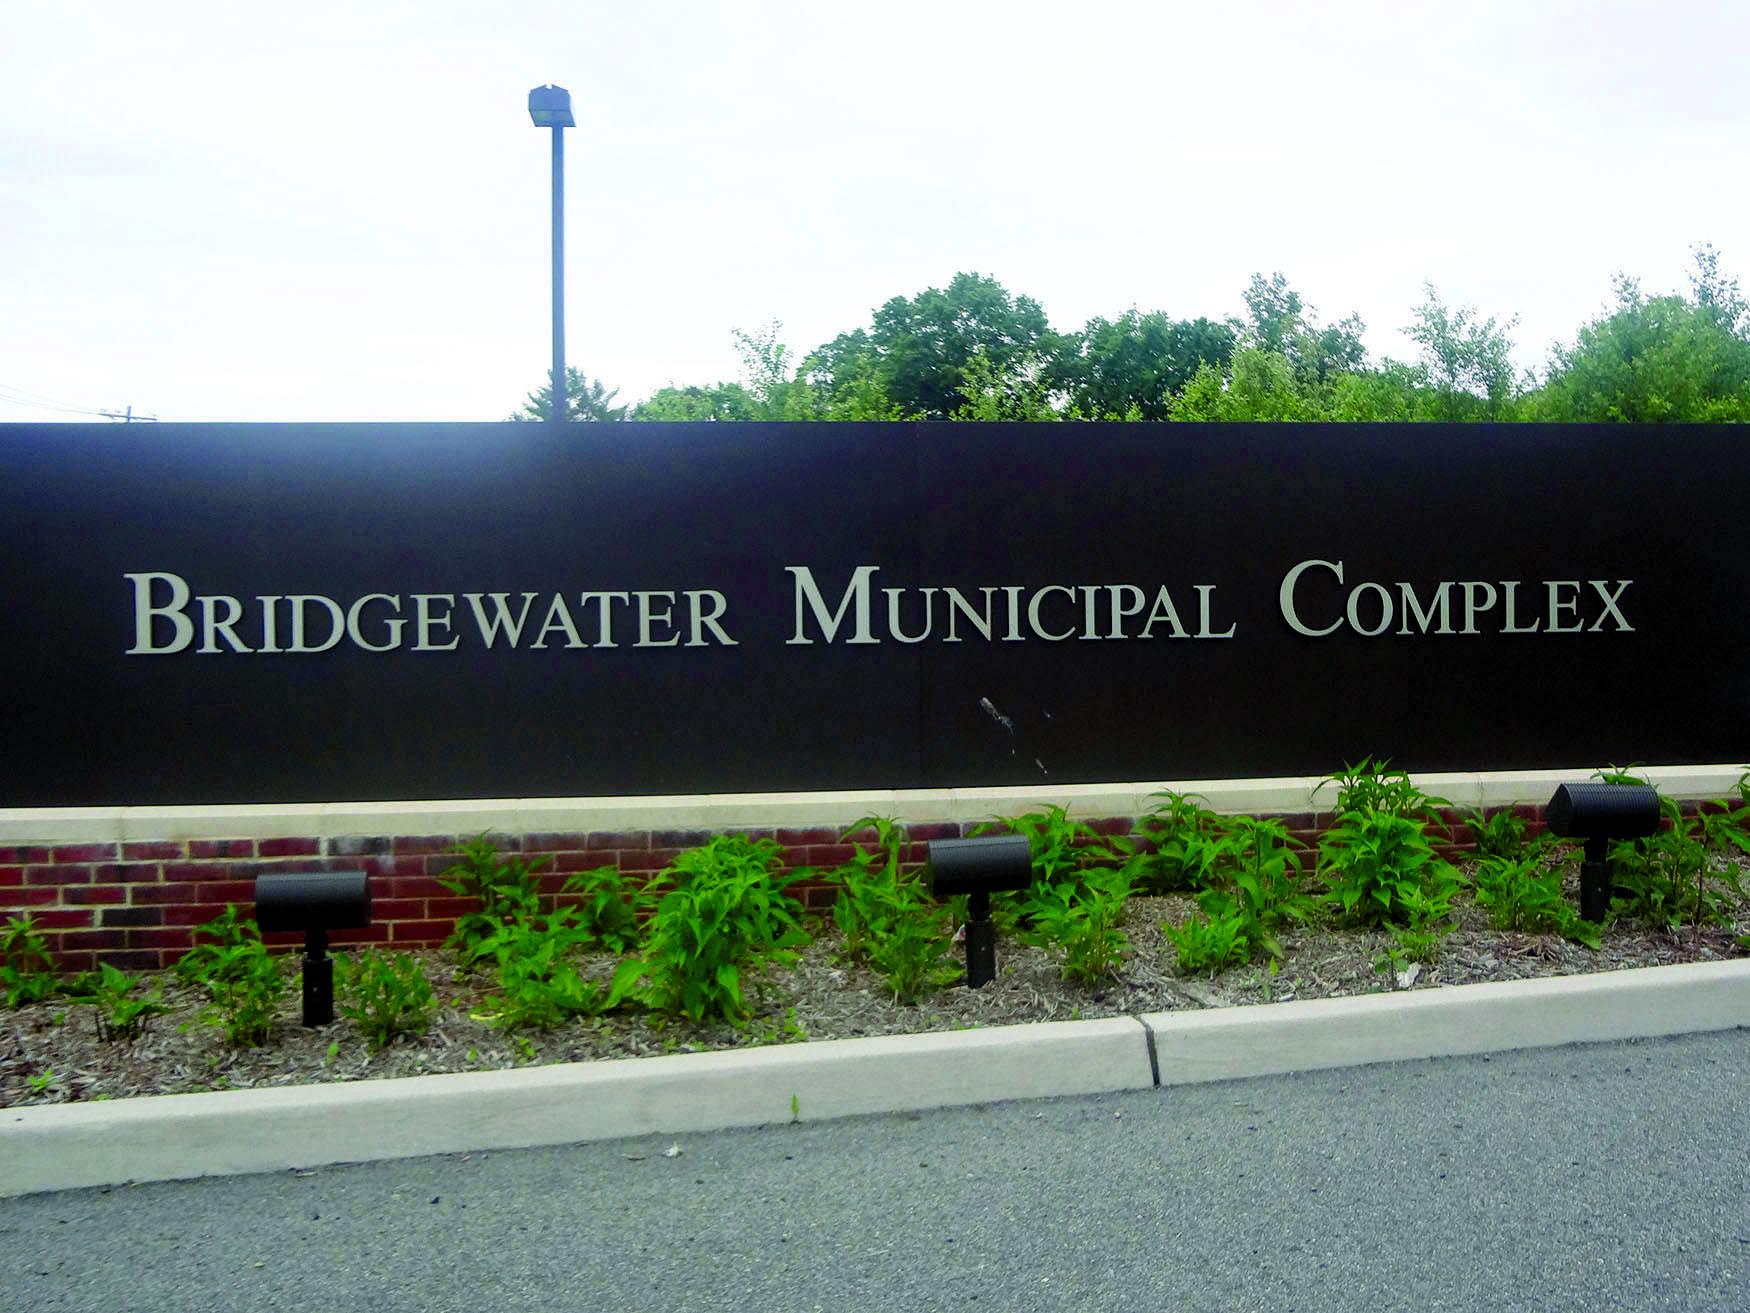 2b58f79a199c7d278ee6_Bridgewater_municipal.jpg